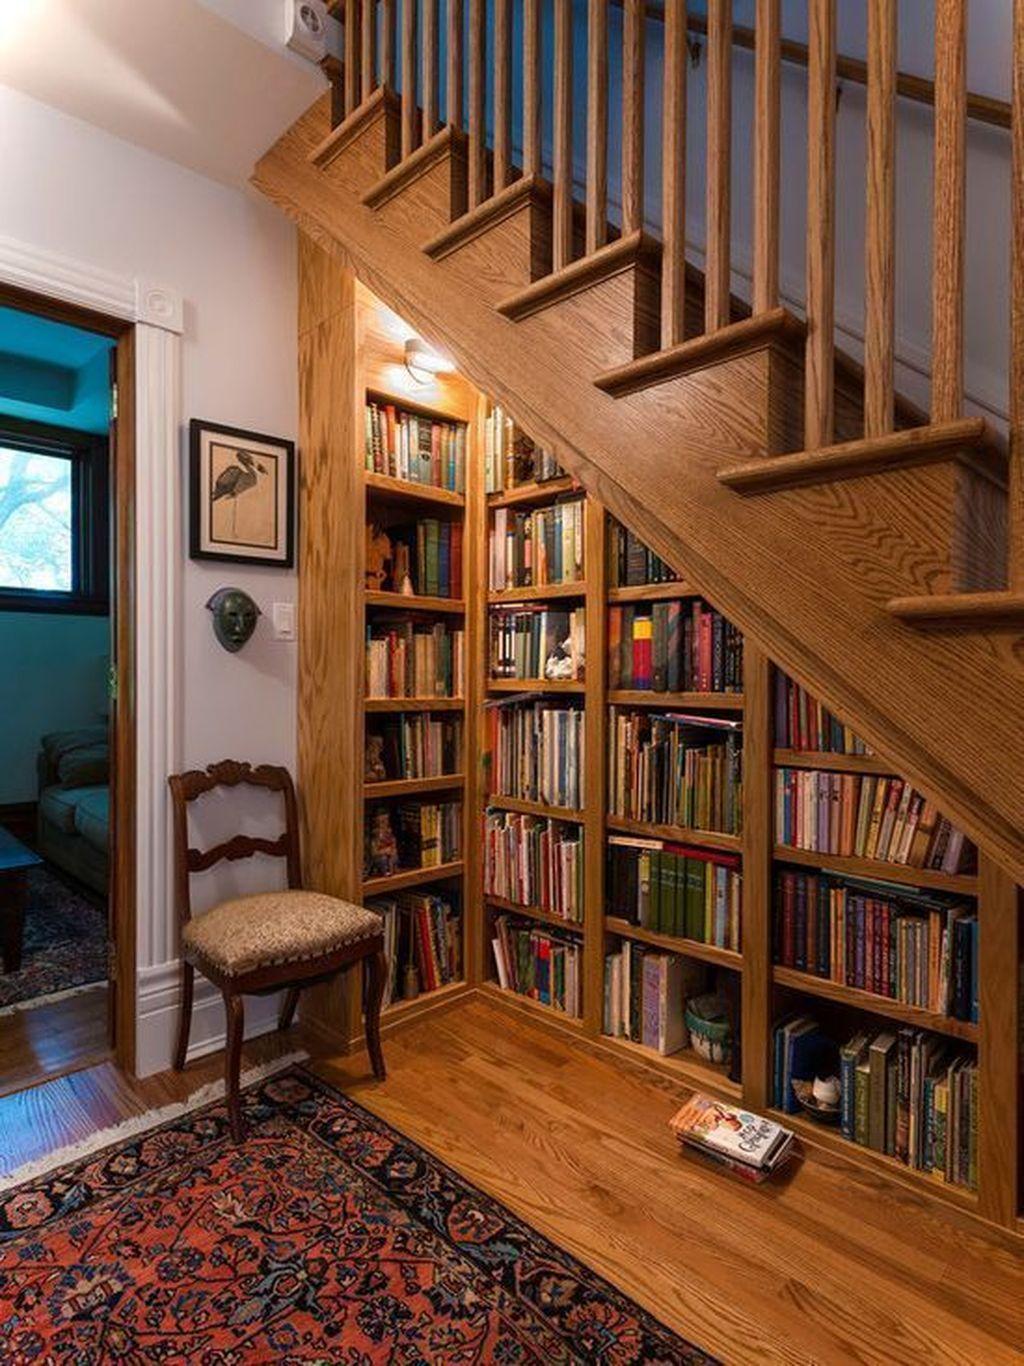 Living Room Library Design Ideas: 46 Amazing Bookshelves Decorating Ideas For Living Room